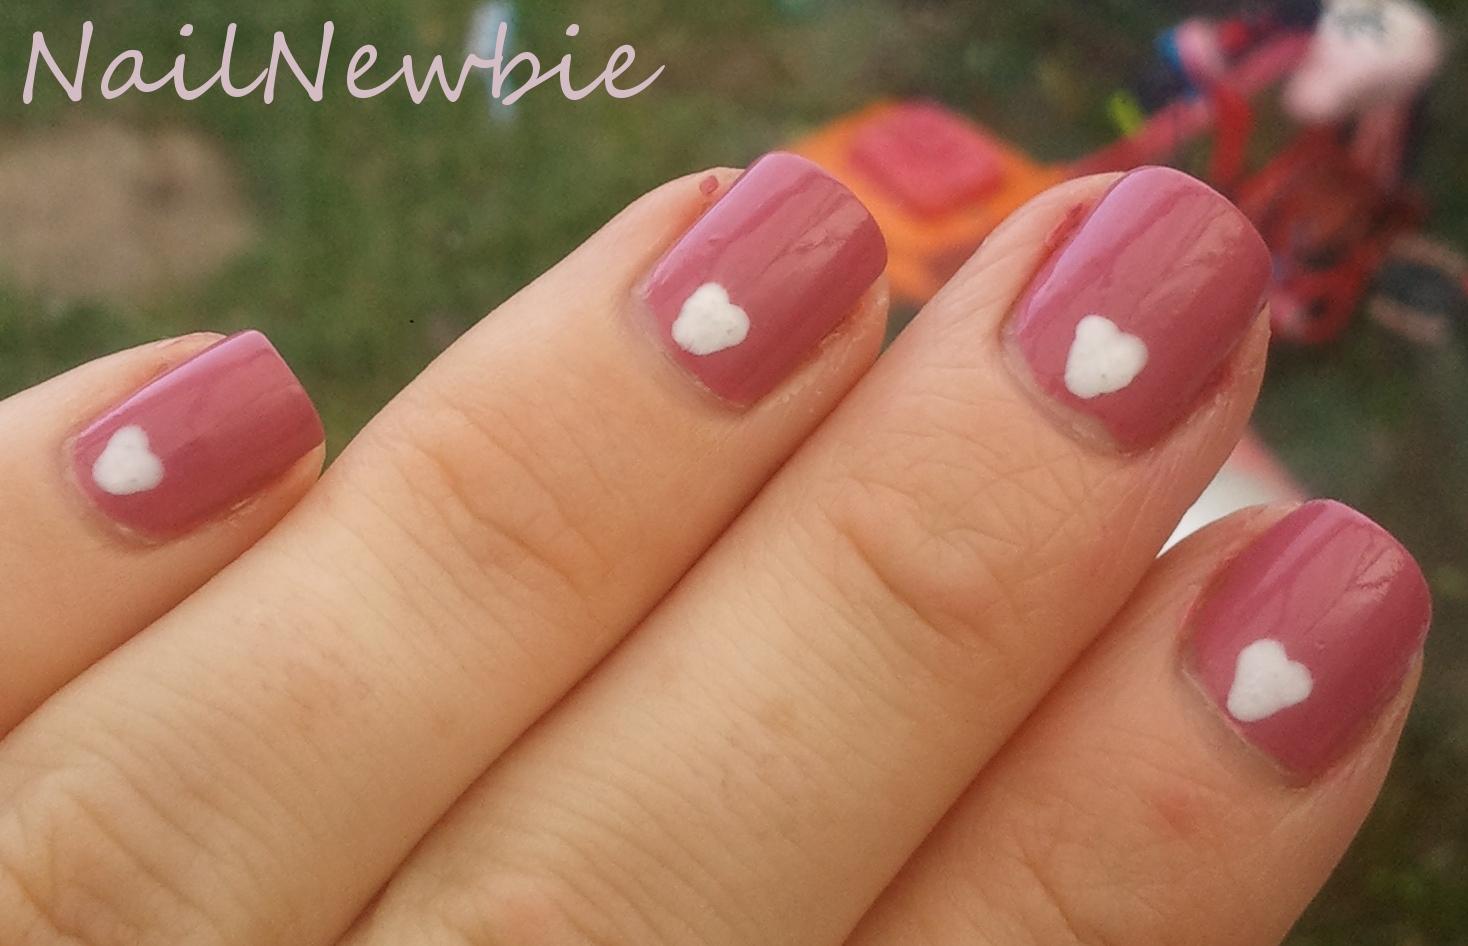 Nail Newbie: October 2011